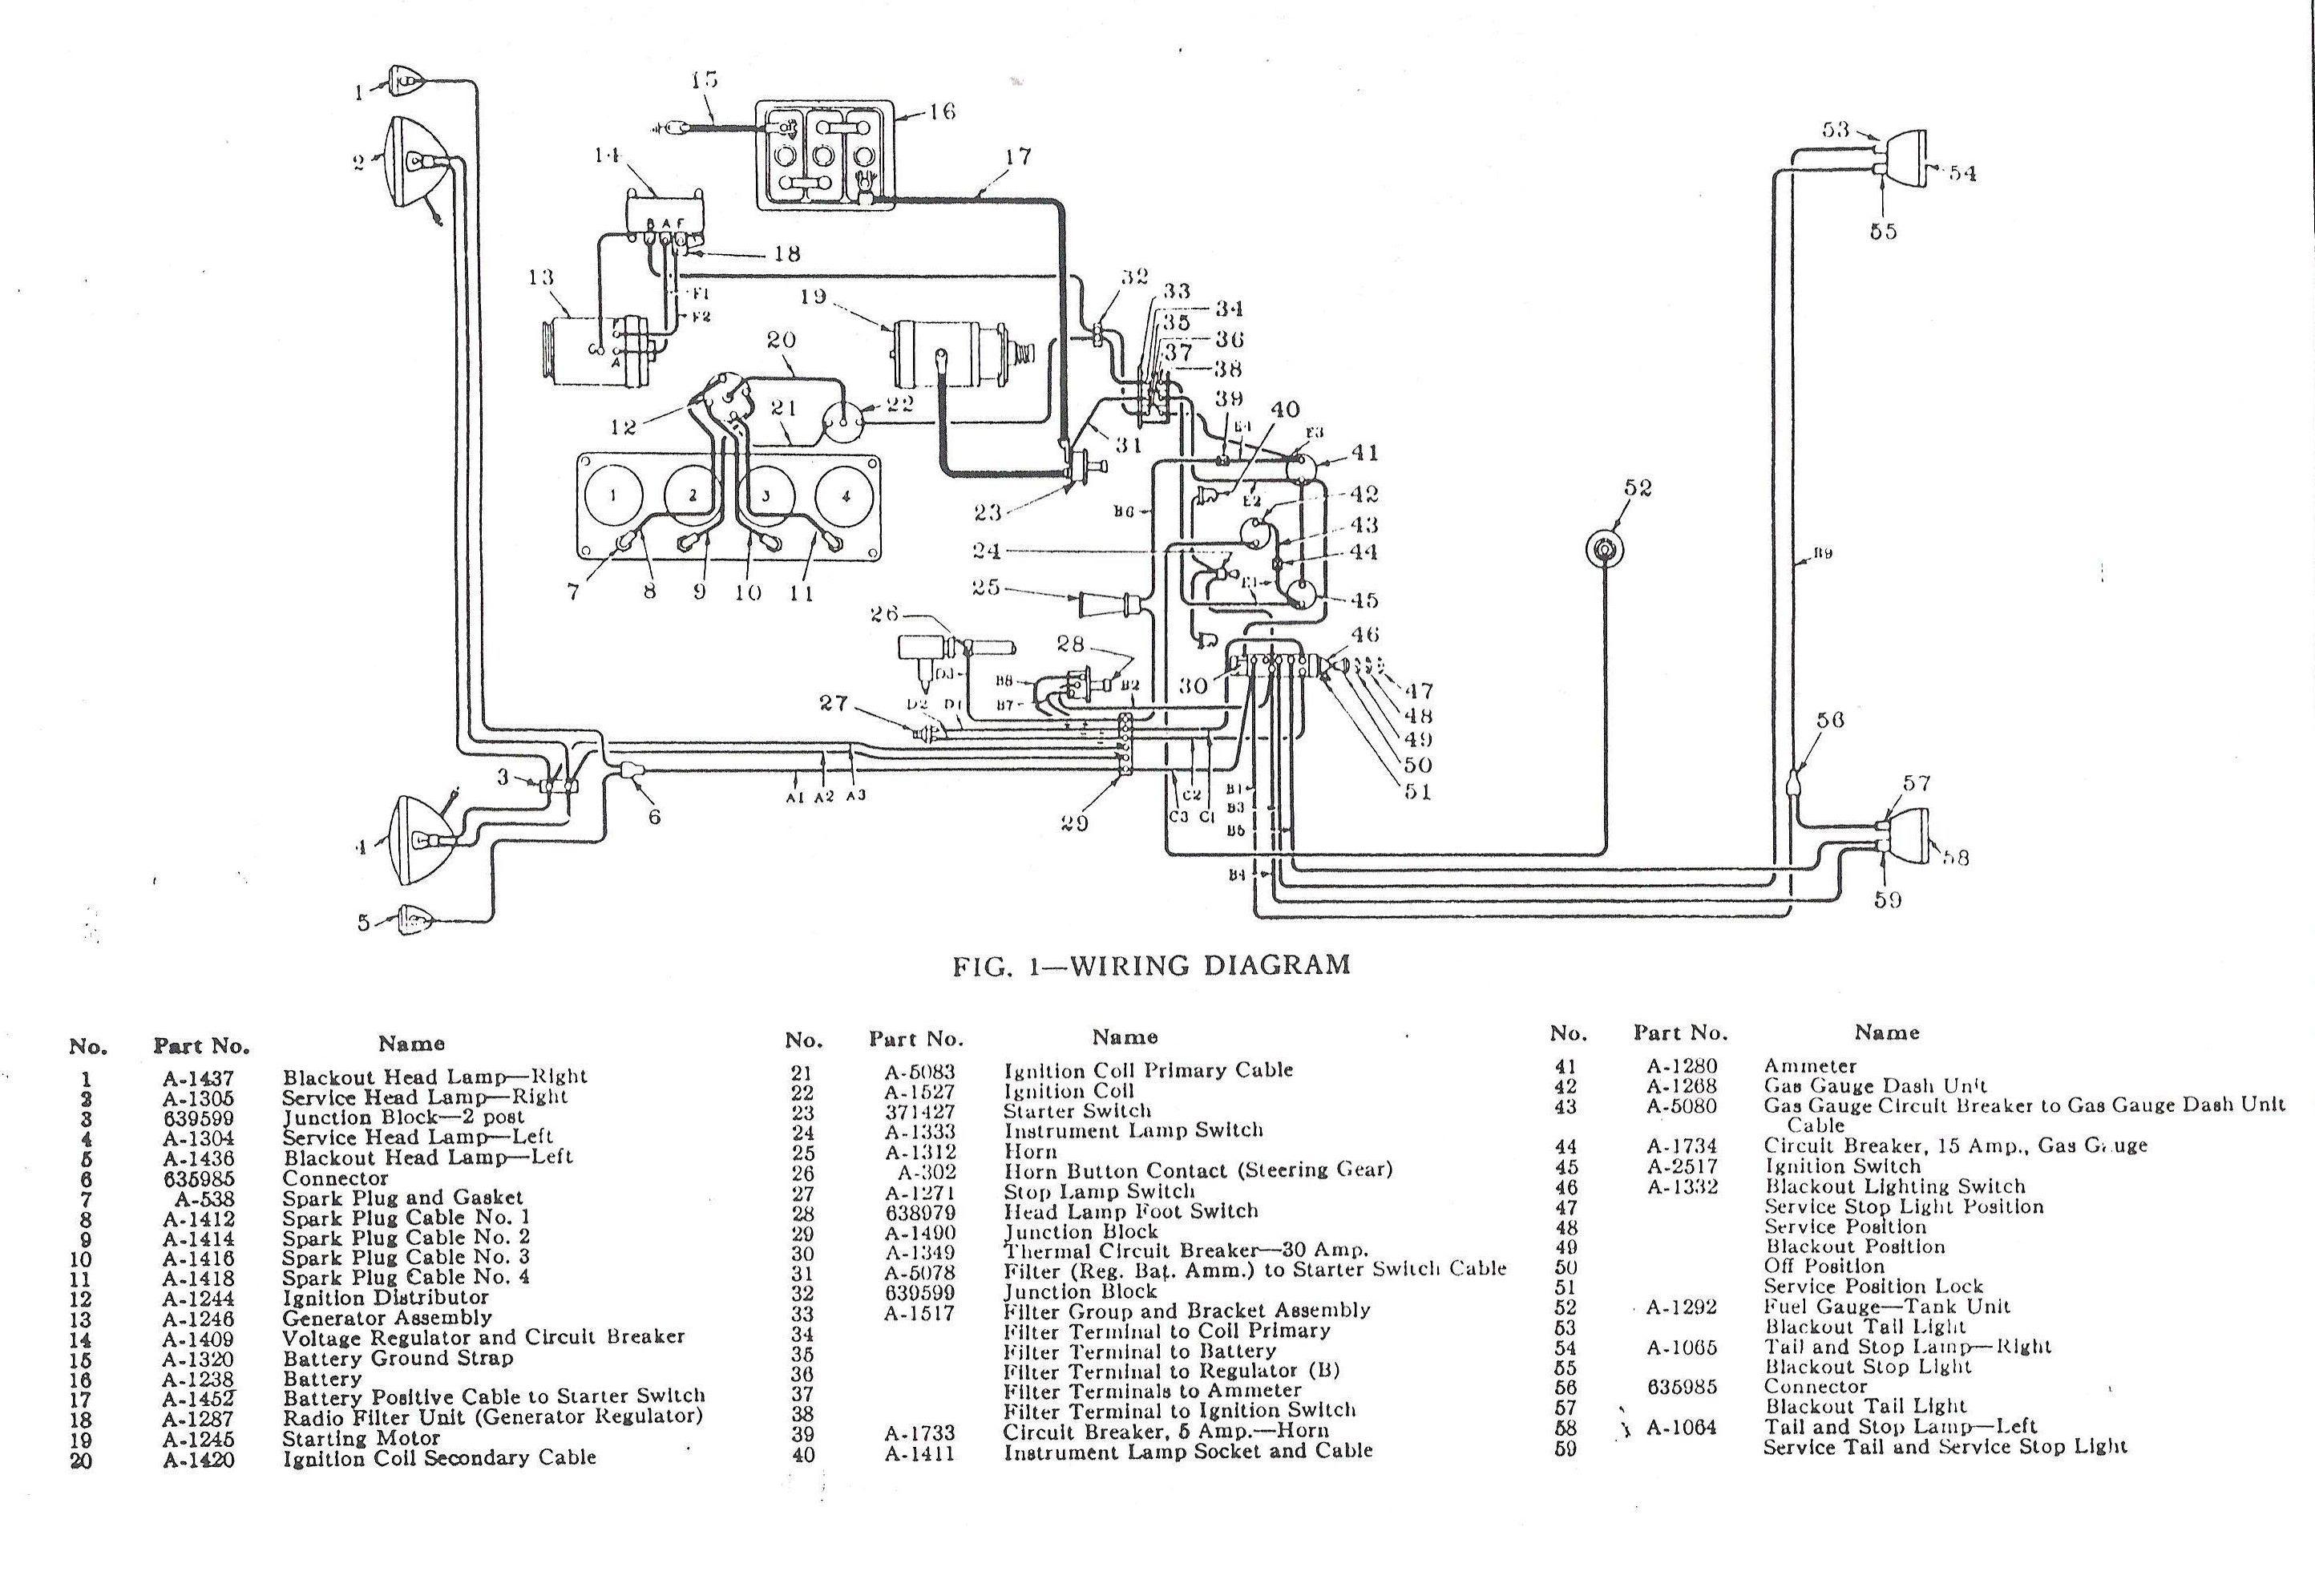 1953 cj3a wiring diagram schematic 1955 cj5 wiring diagram e1 wiring diagram  1955 cj5 wiring diagram e1 wiring diagram